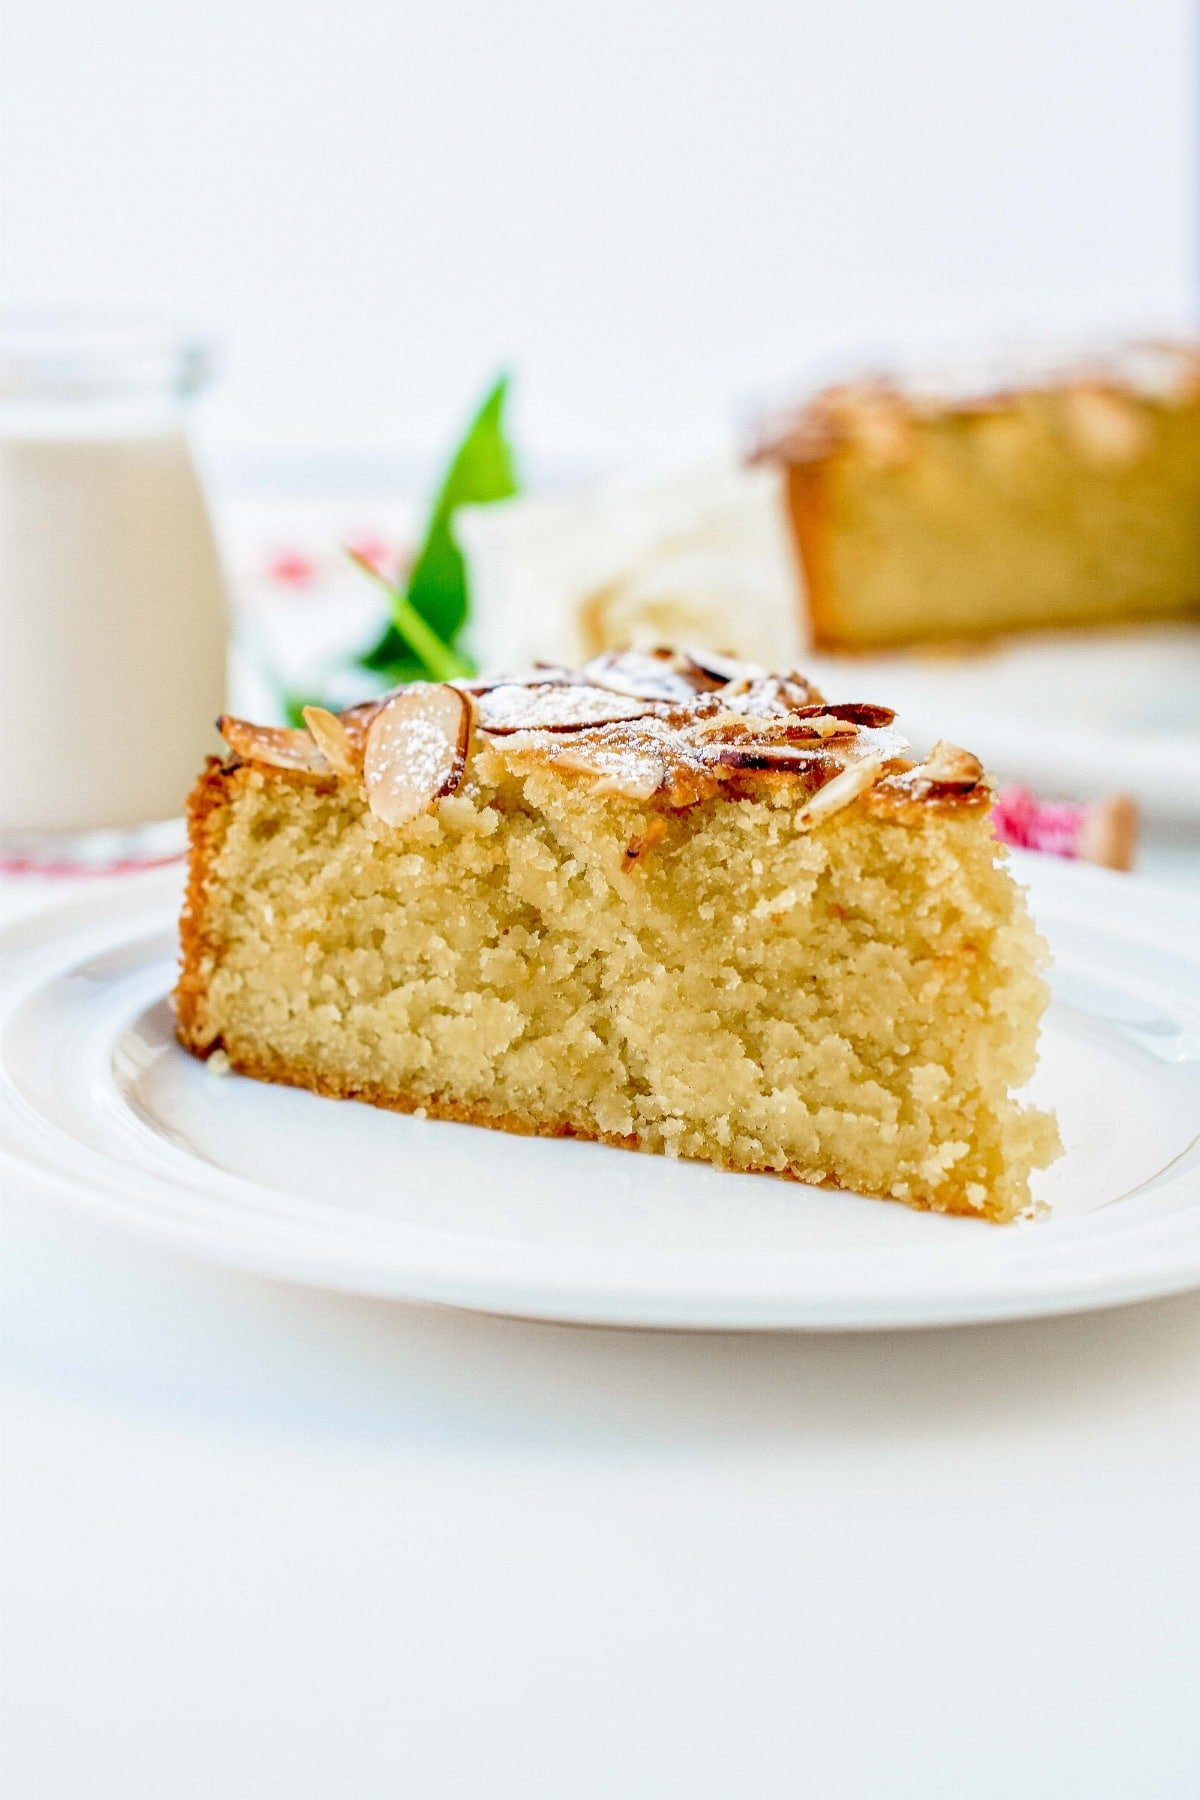 Keto French Almond Cake